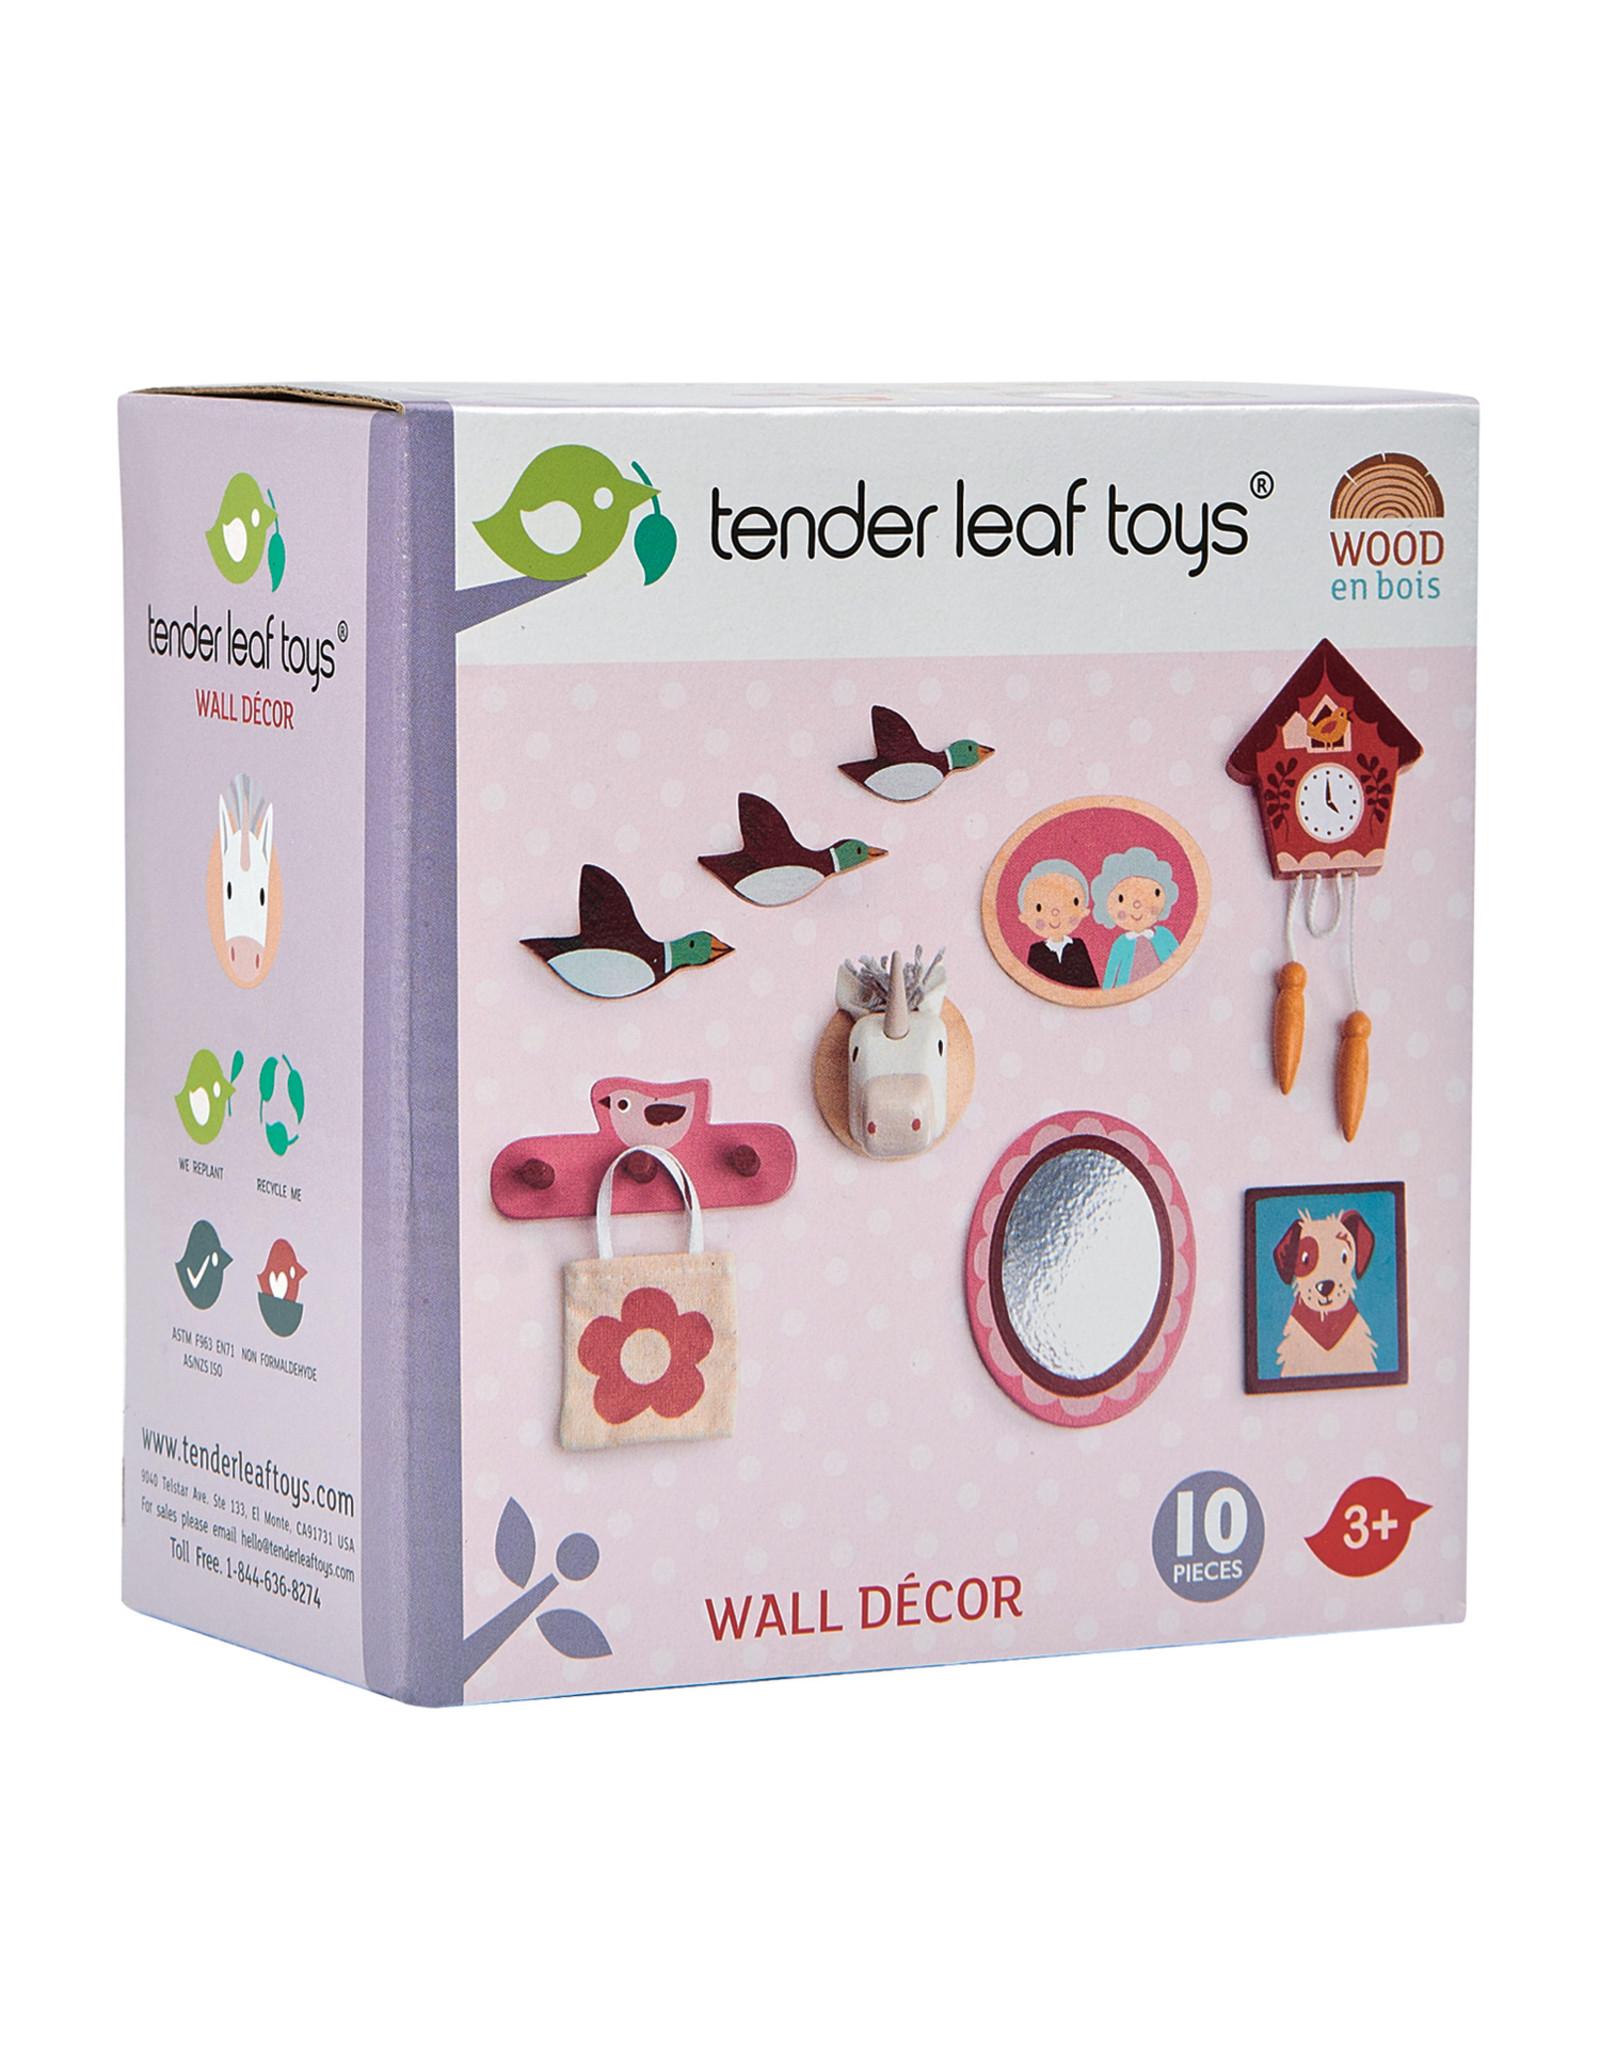 Tender Leaf Toys Tender Leaf Toys Wall Decor